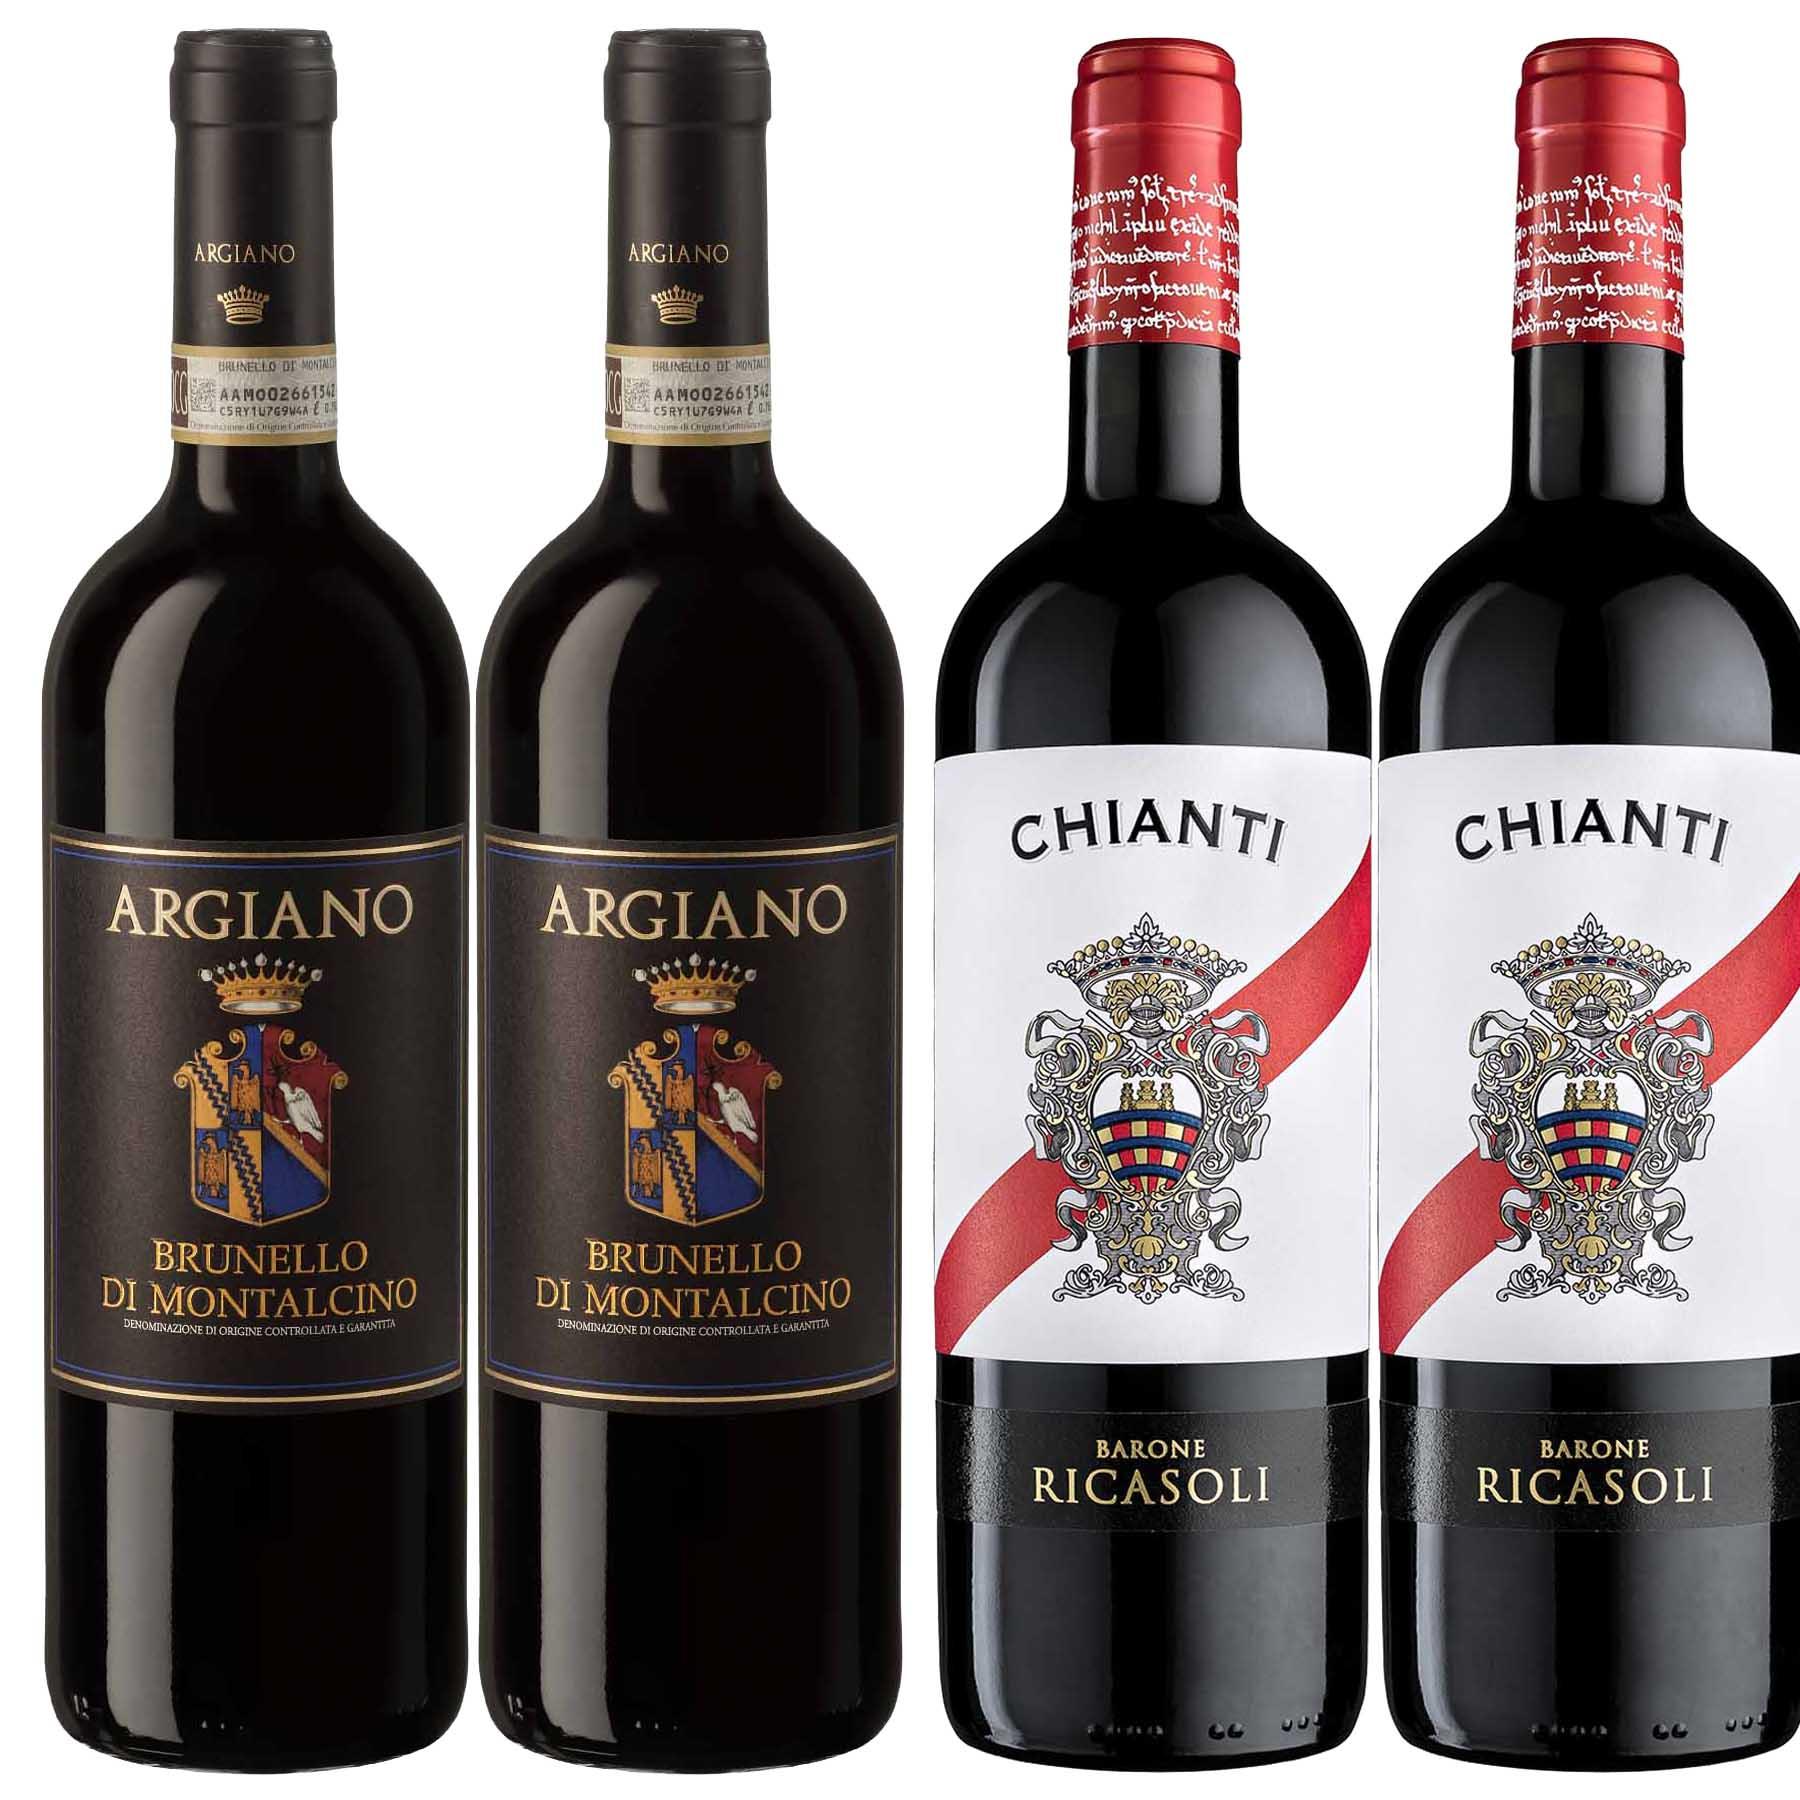 Kit Toscana 4 Vinhos: Chianti Ricasoli e Brunello Argiano